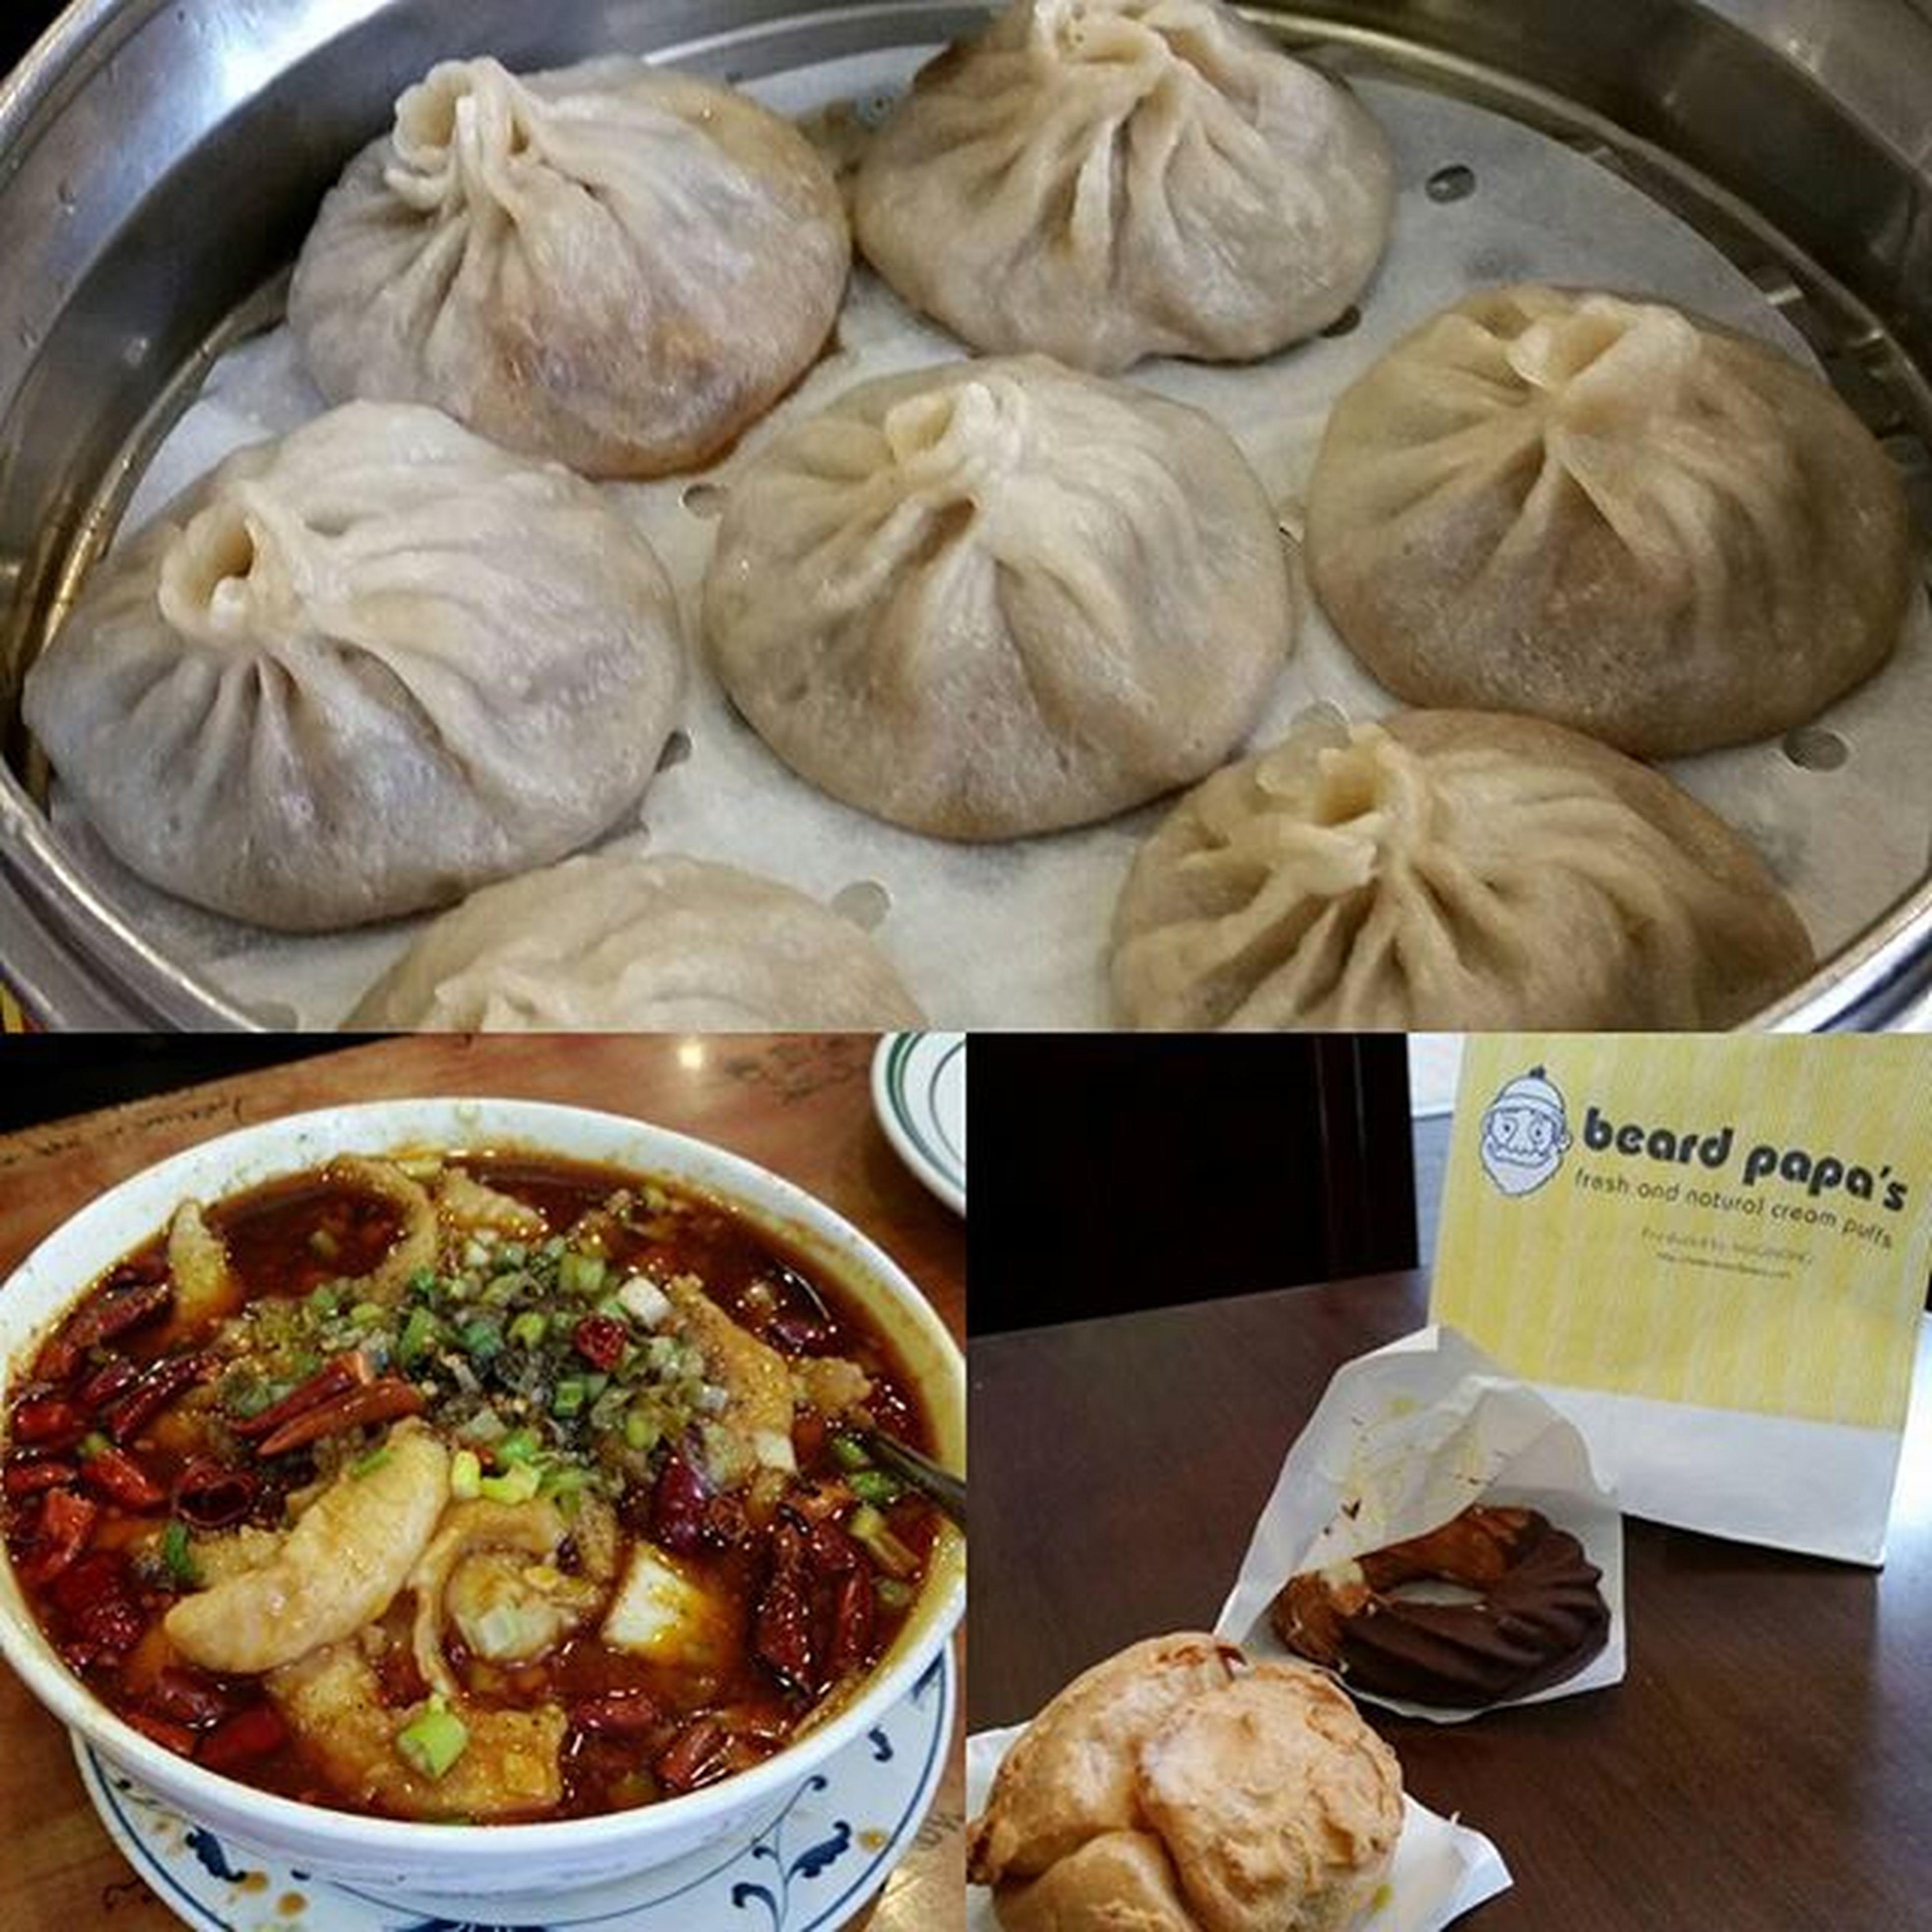 Boston Chinatown food adventures Bostonfoodies Foodporn Chinatown Soupdumplings Beardpapas Creampuff Celebritiesatehere Morefoodnotpictured Somuchfood Nofilters